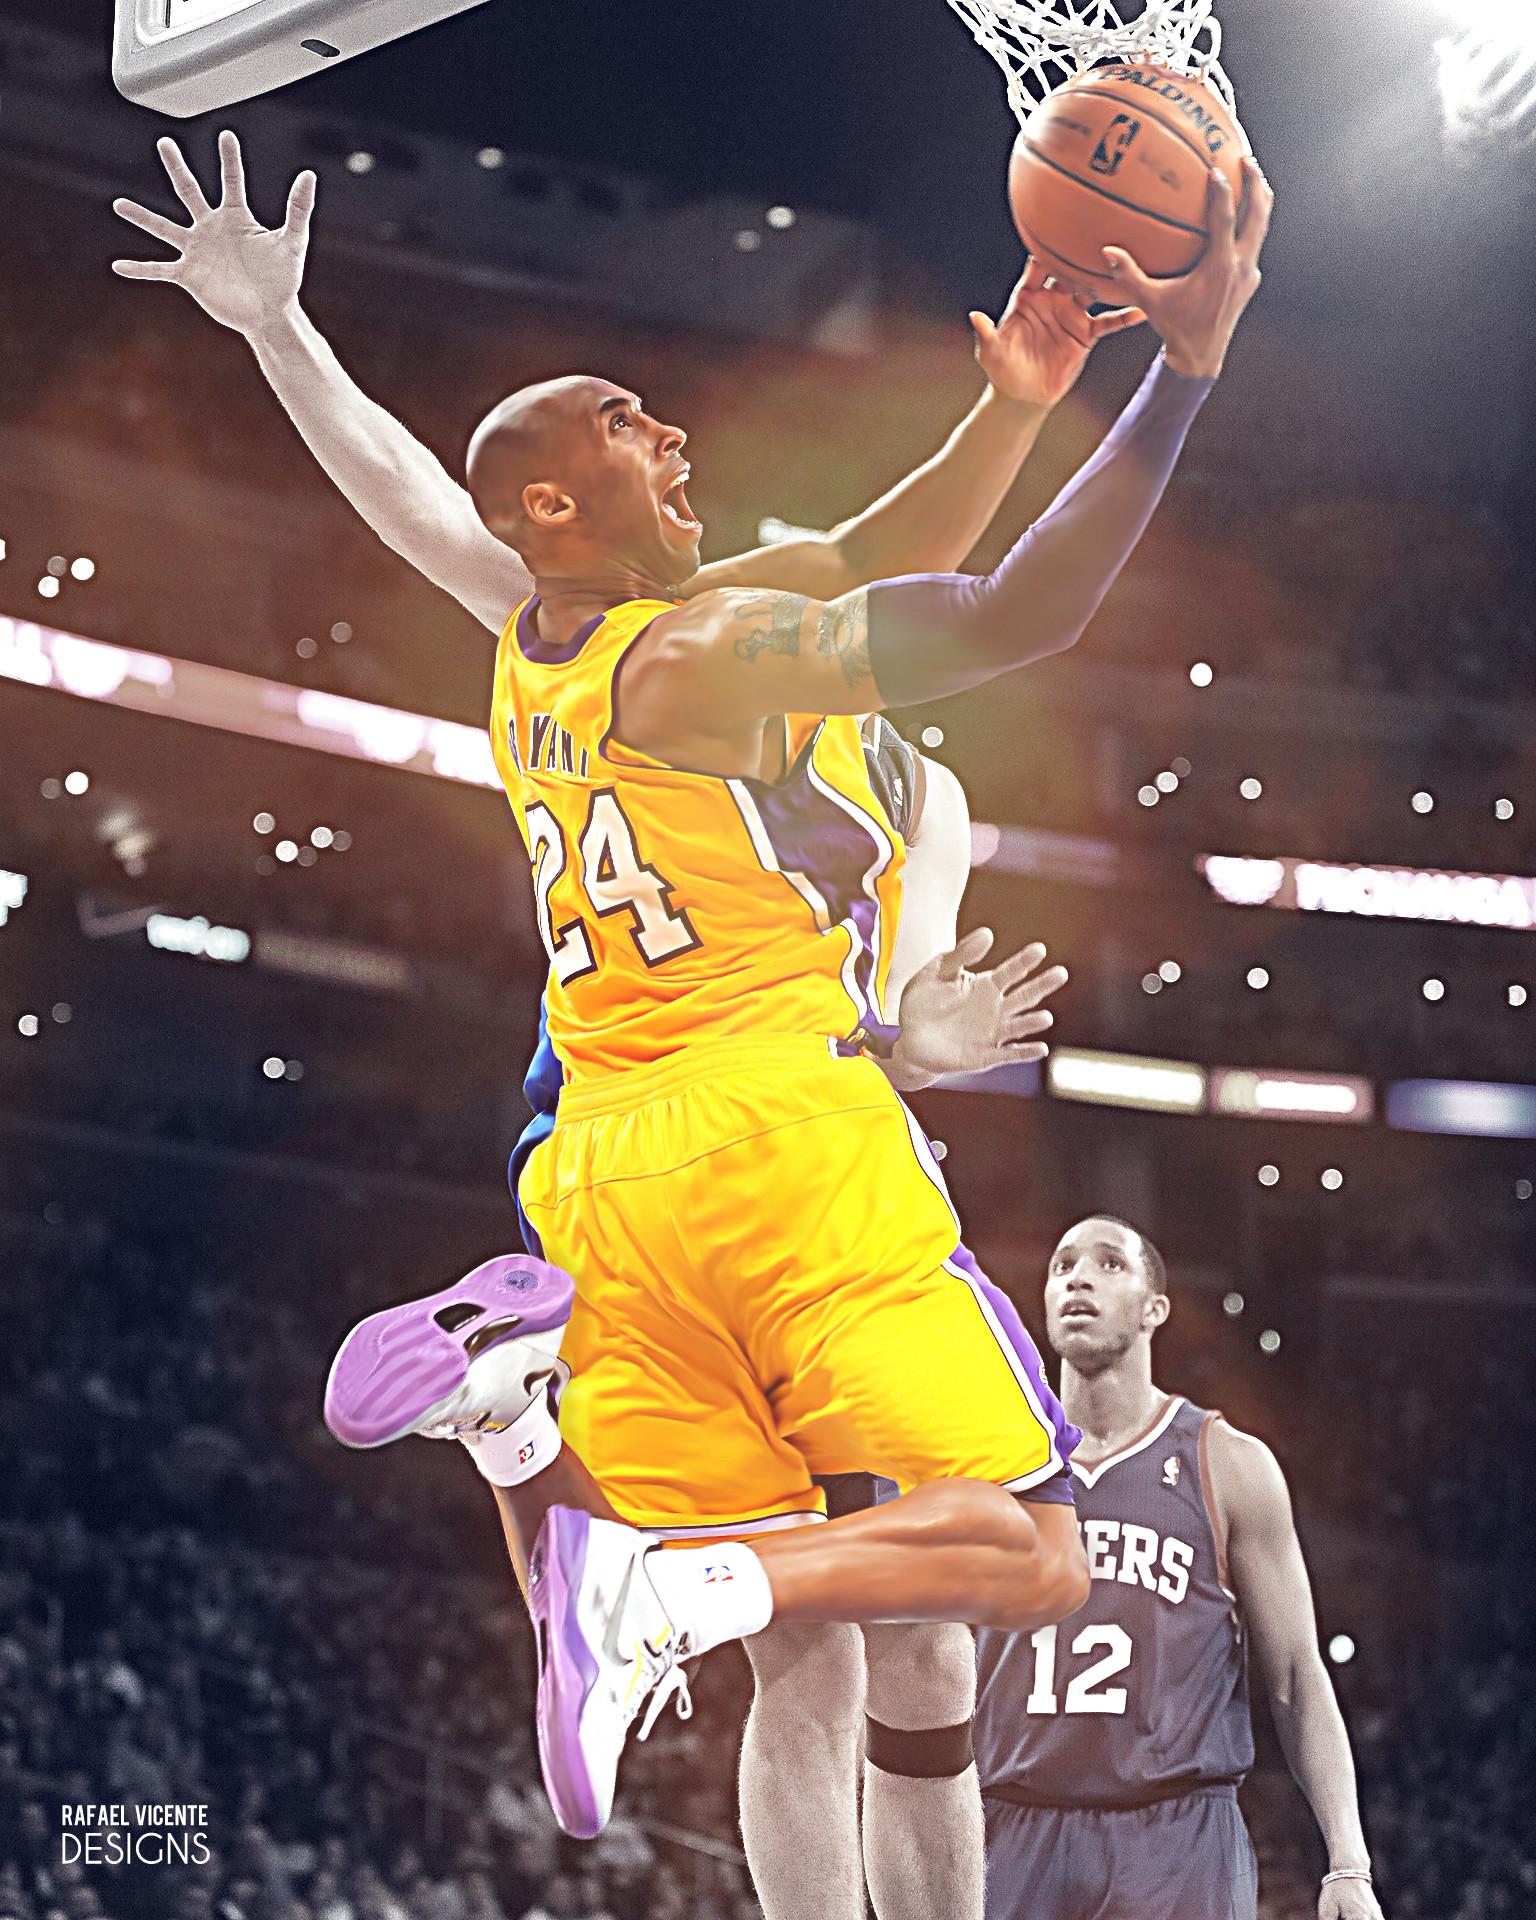 Kobe Bryant by RafaelVicenteDesigns Kobe Bryant by RafaelVicenteDesigns